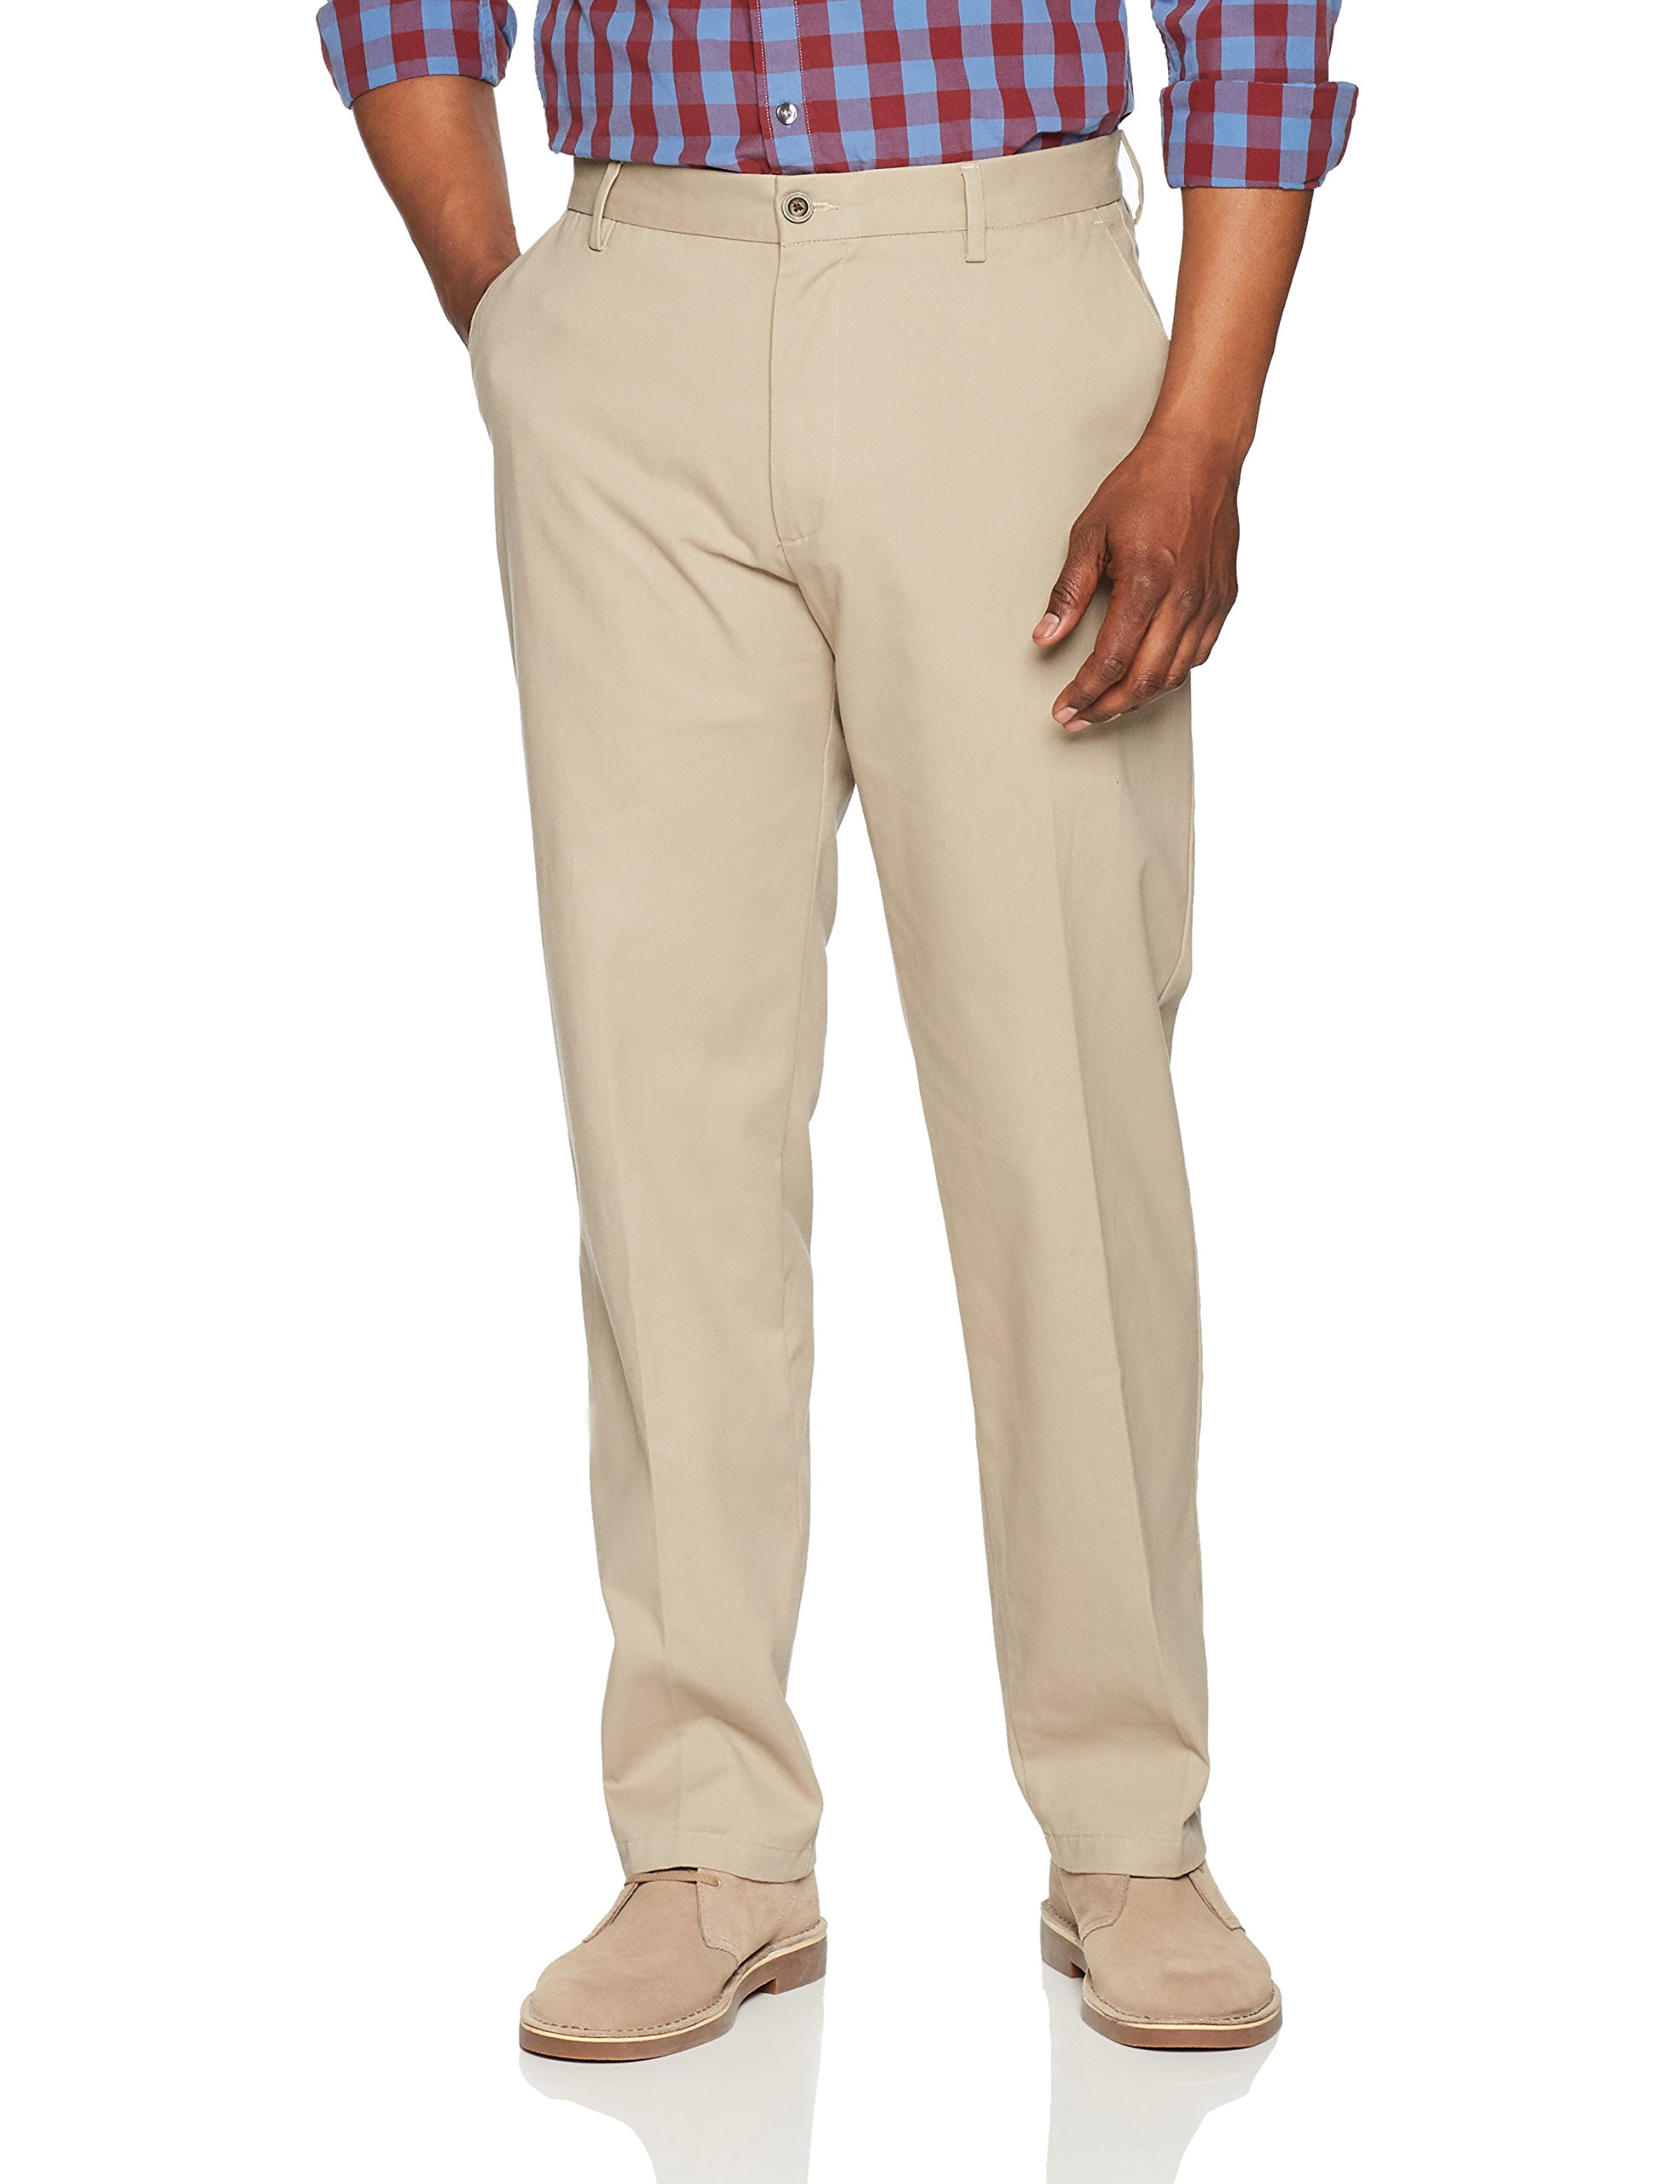 Amazon Essentials Men's Classic-Fit Wrinkle-Resistant Flat-Front Chino Pant, Khaki, 32W x 32L